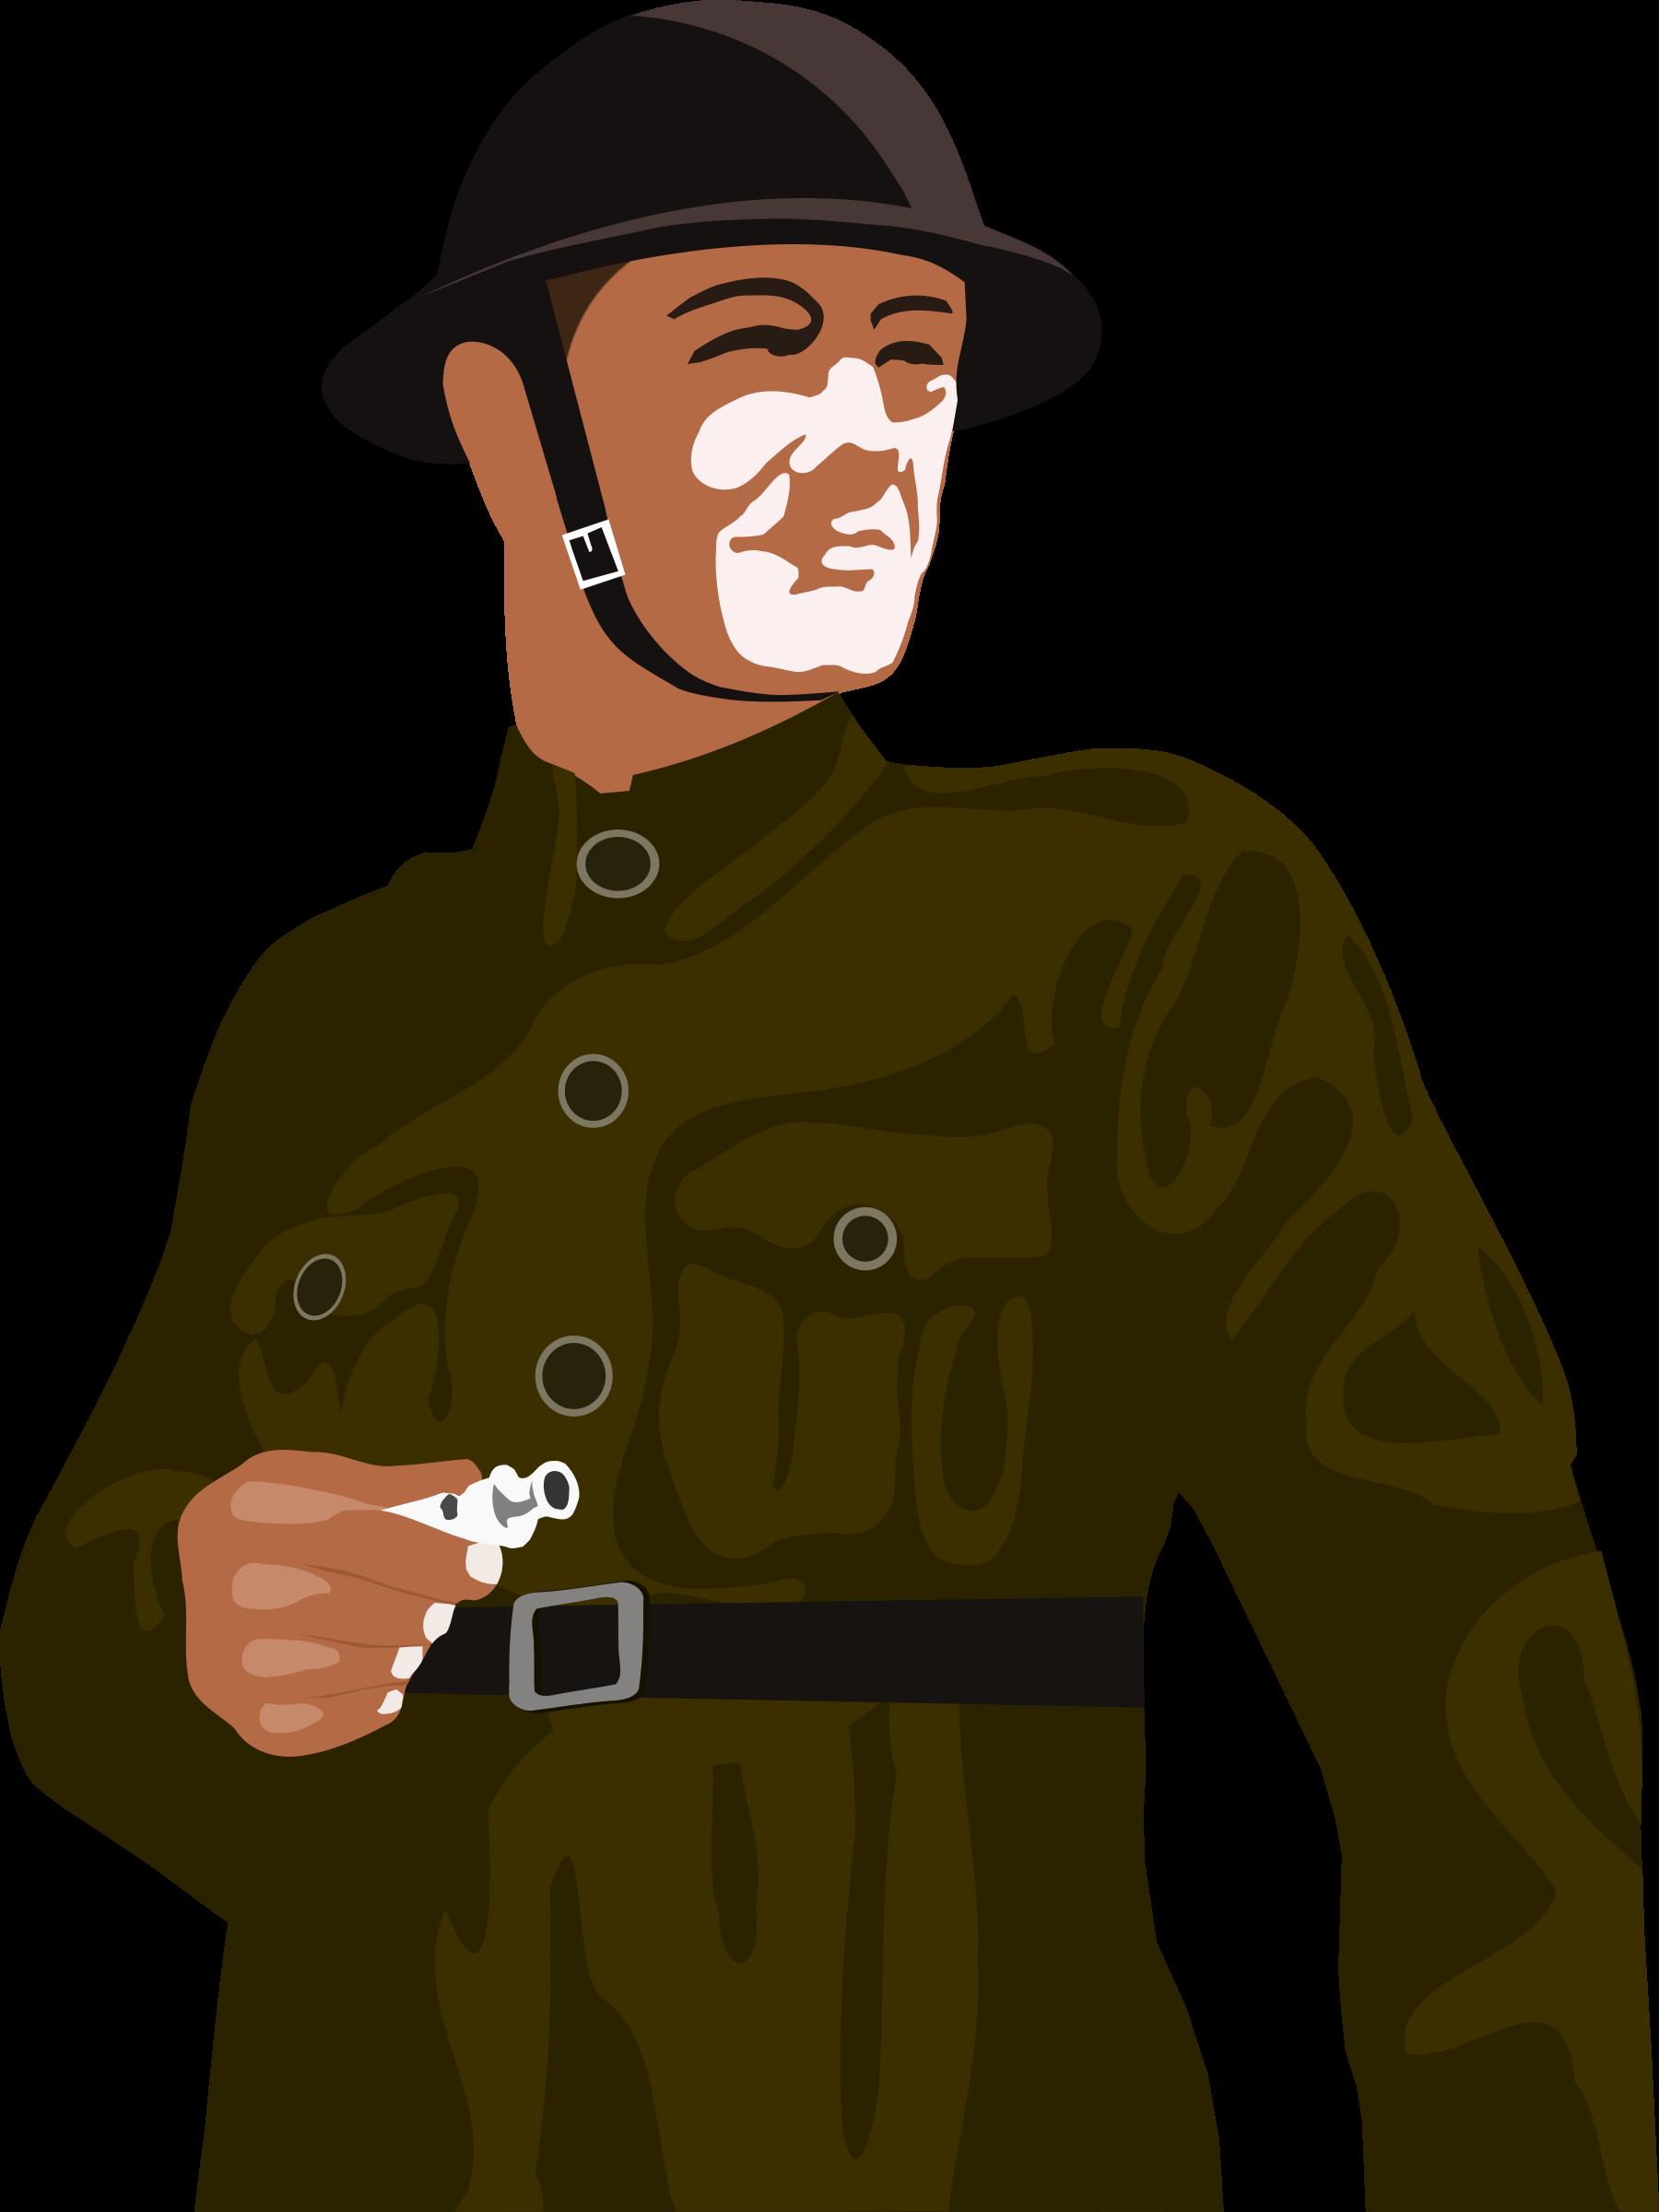 Army clipart british person #1